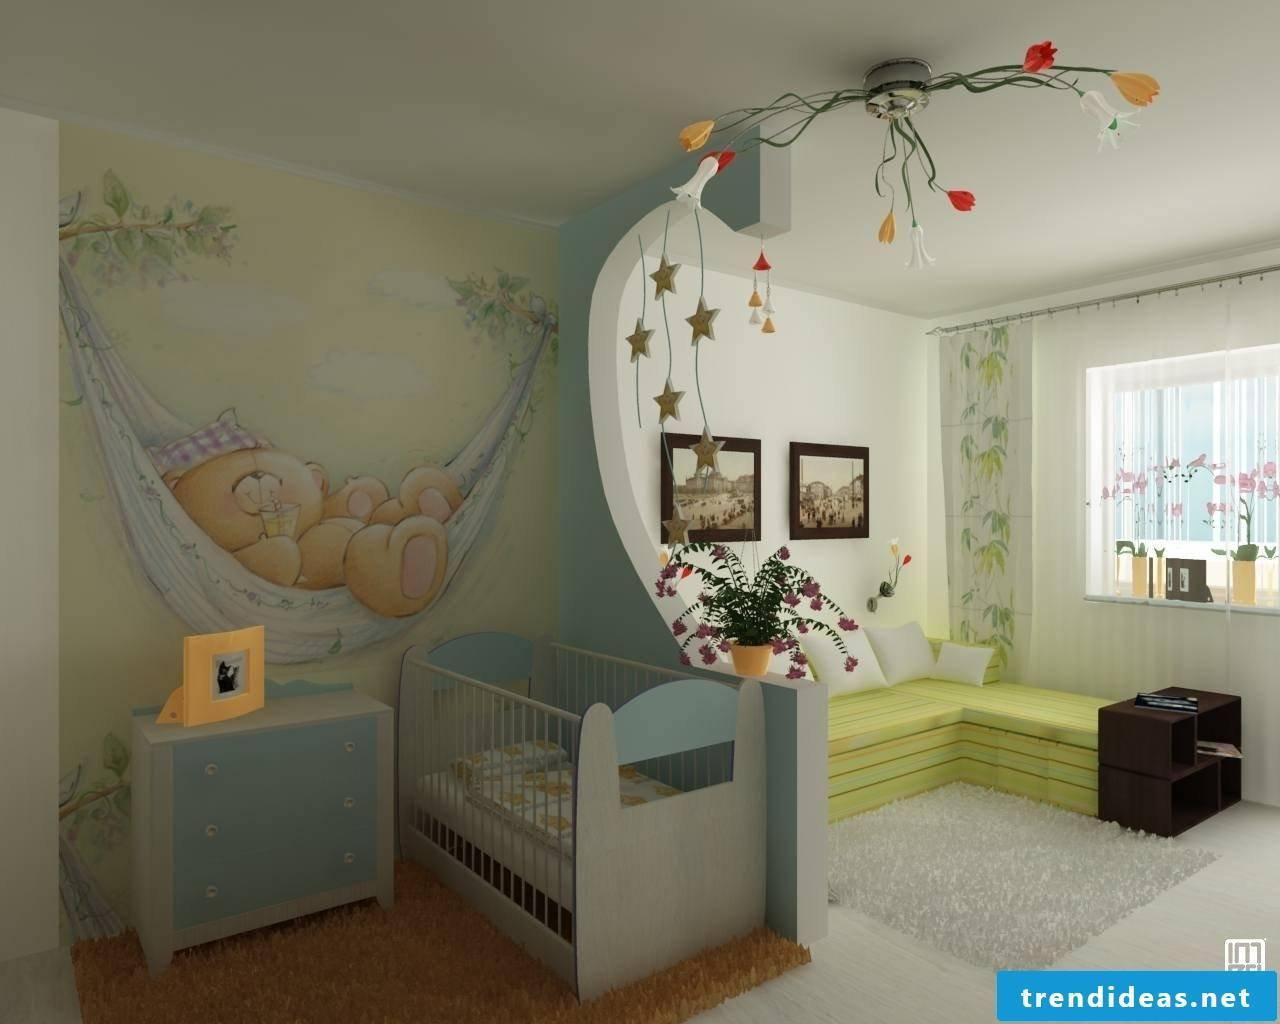 Nursery design, soft colors and coziness